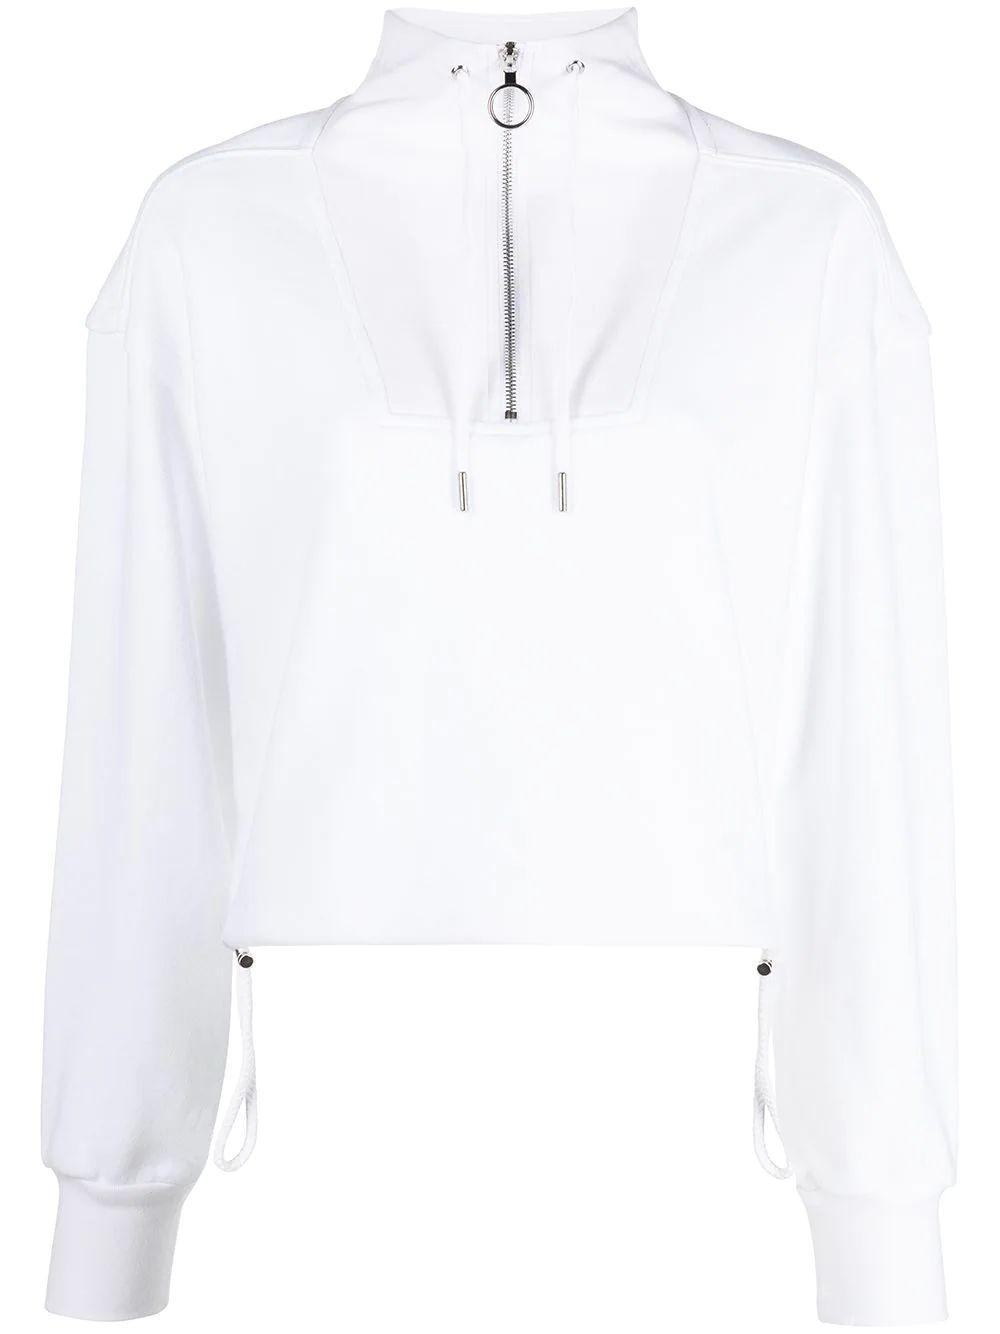 Zella Quarter Zip Pullover Item # 321-2089-ST